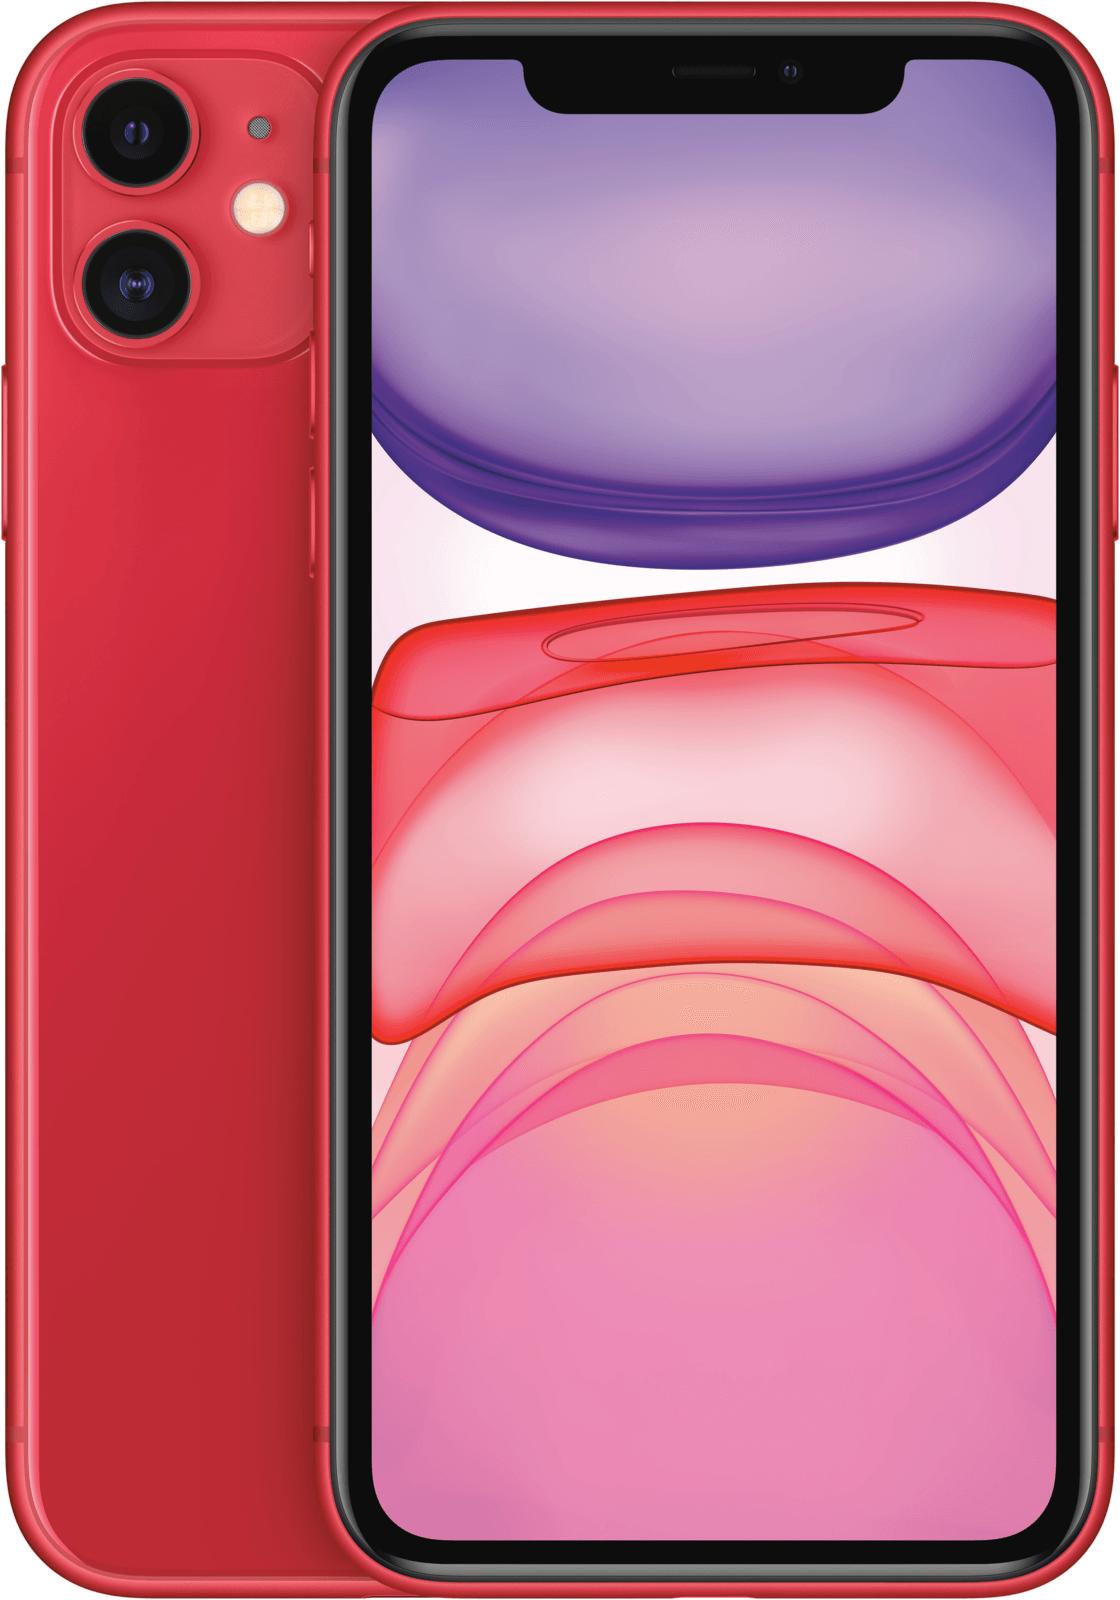 APPLE iPhone 11, Smartphone, 128 GB,Red, Dual SIM